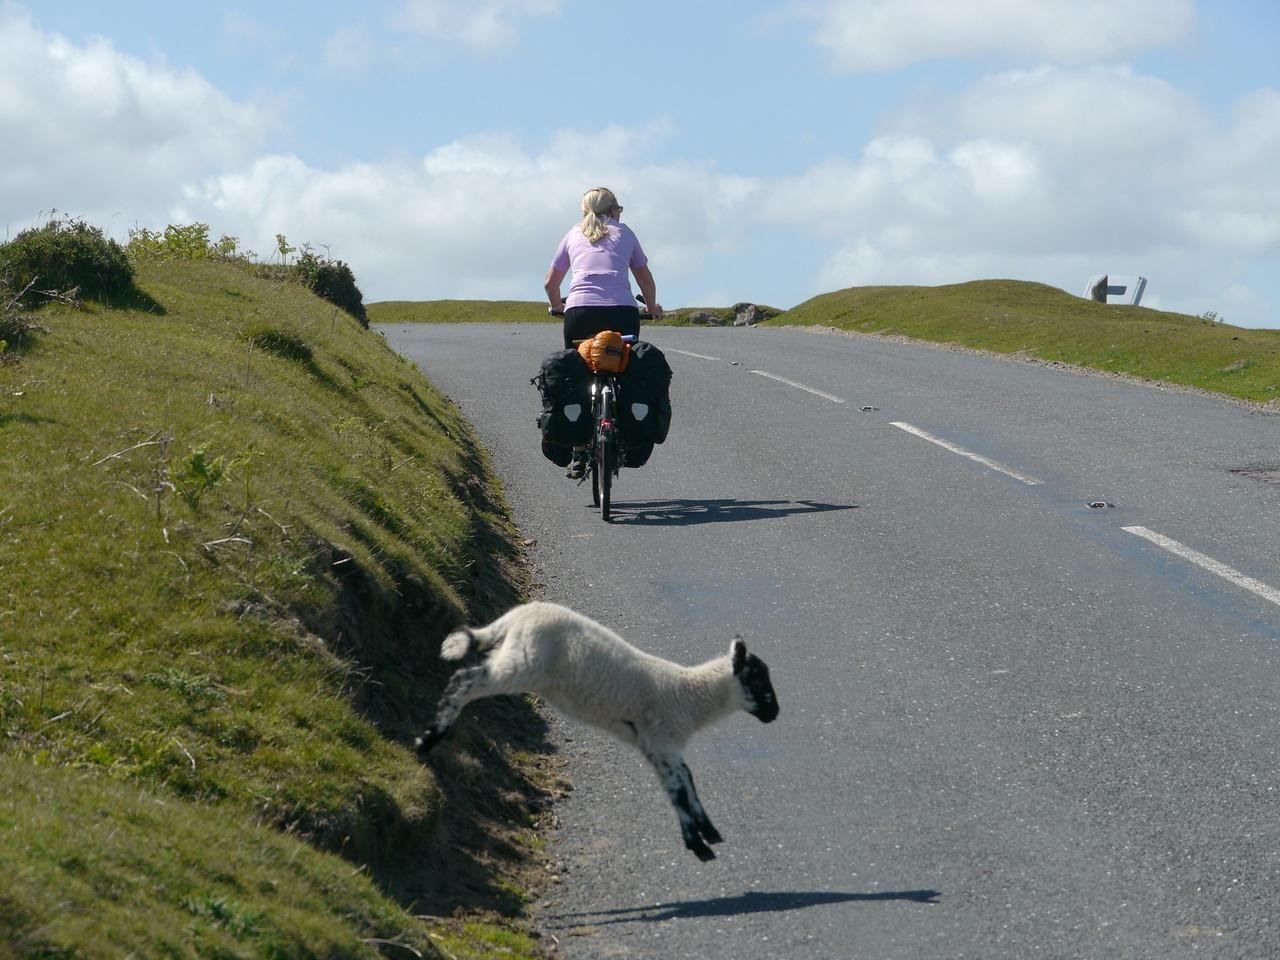 © RobAng 2011, Velotour GB (Dorset-Devon-Cornwall), Devon, North Bovey, North Bovey, 355 m